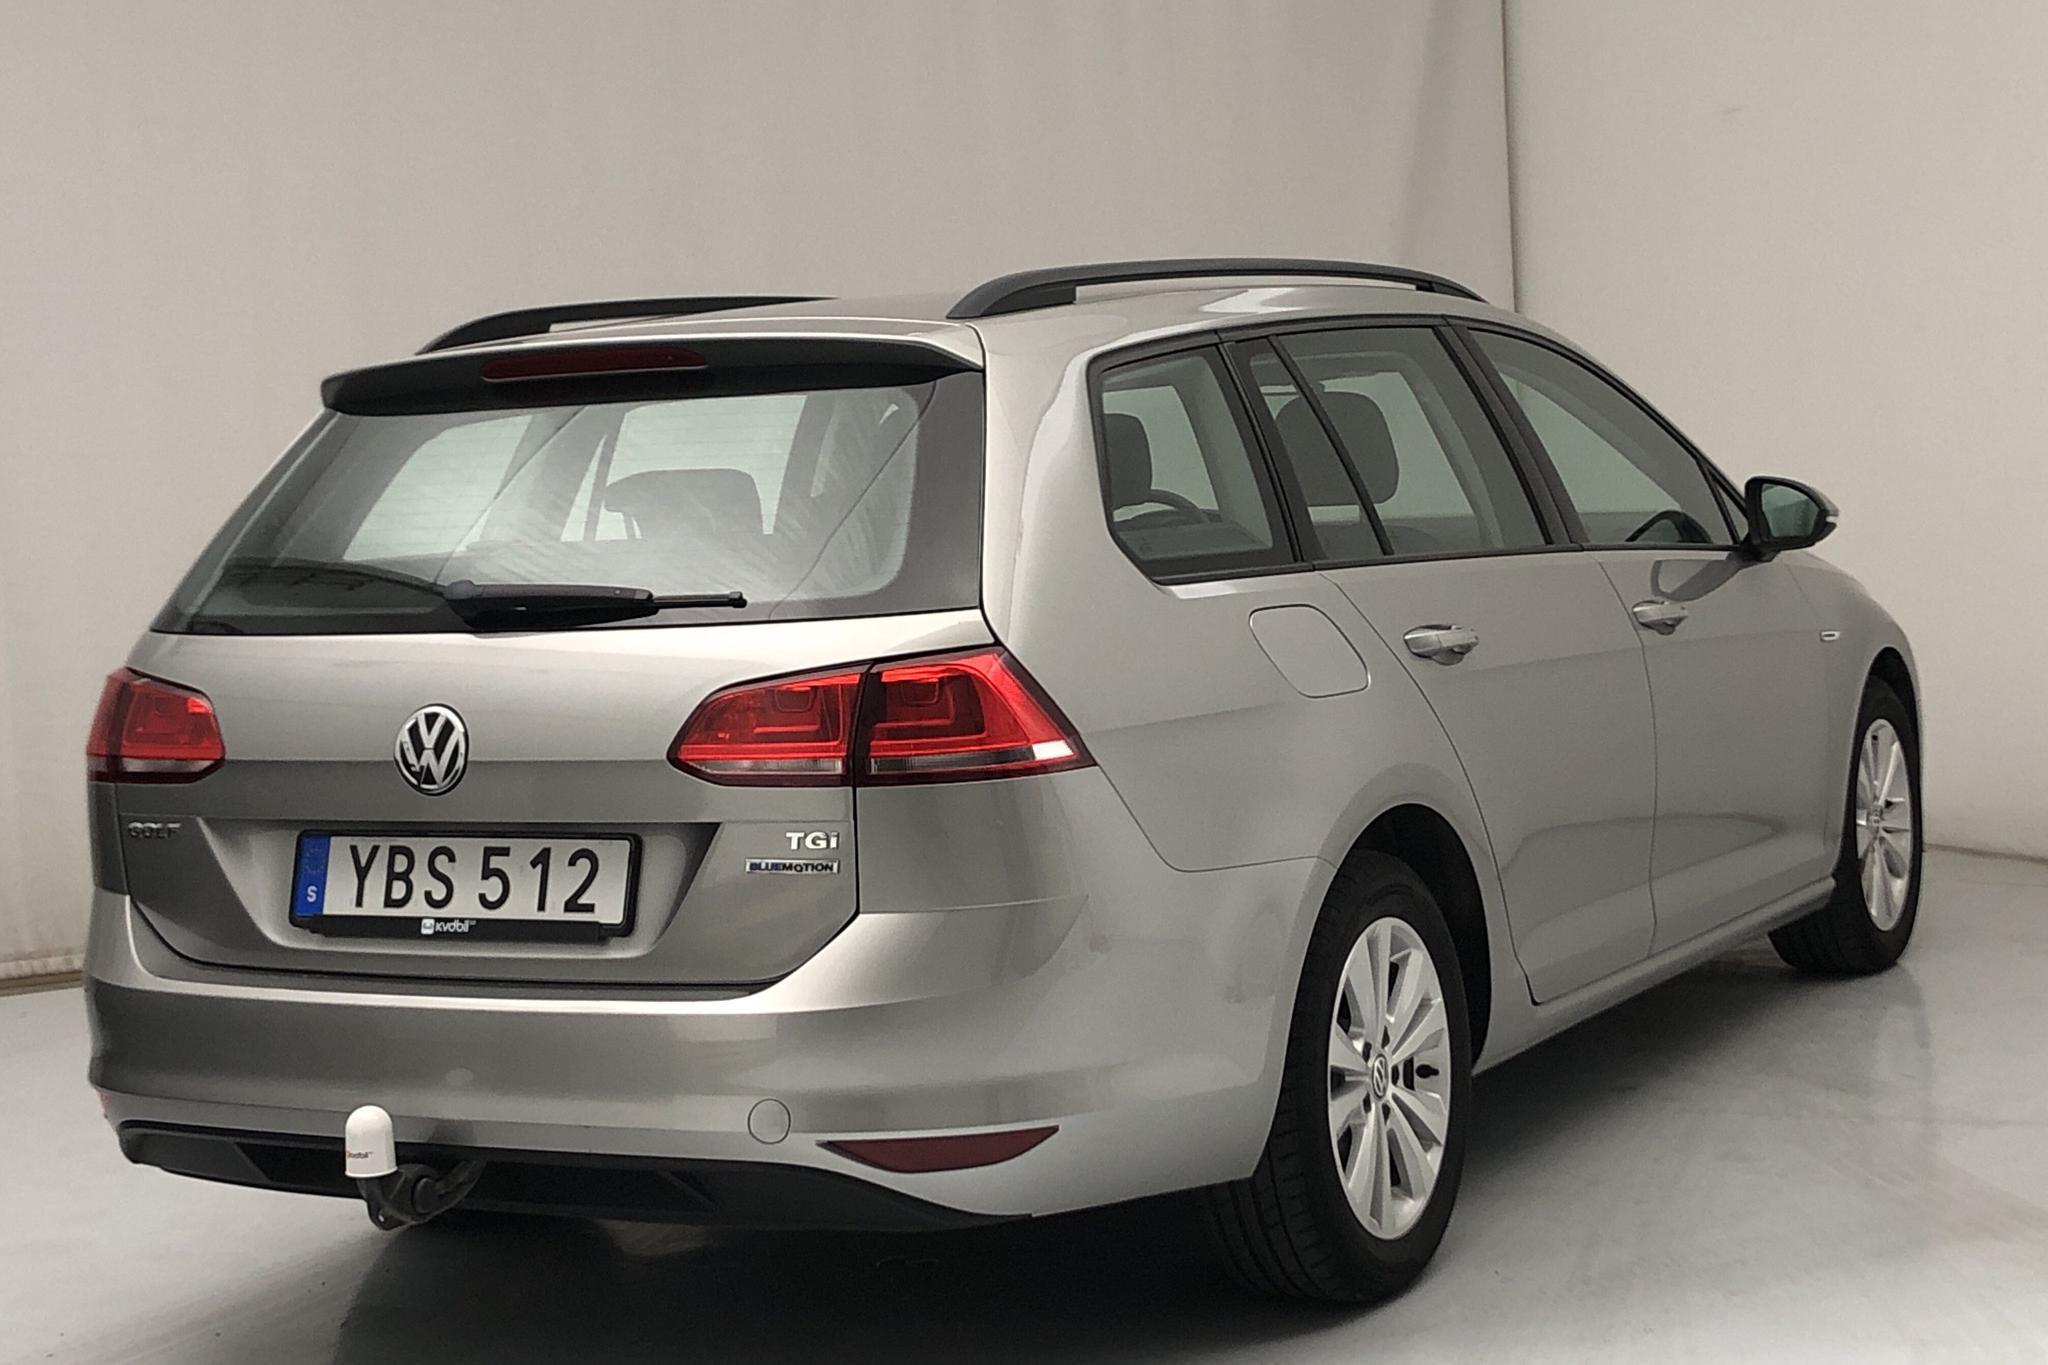 VW Golf VII 1.4 TGI BlueMotion Sportscombi (110hk) - 47 320 km - Manual - silver - 2016